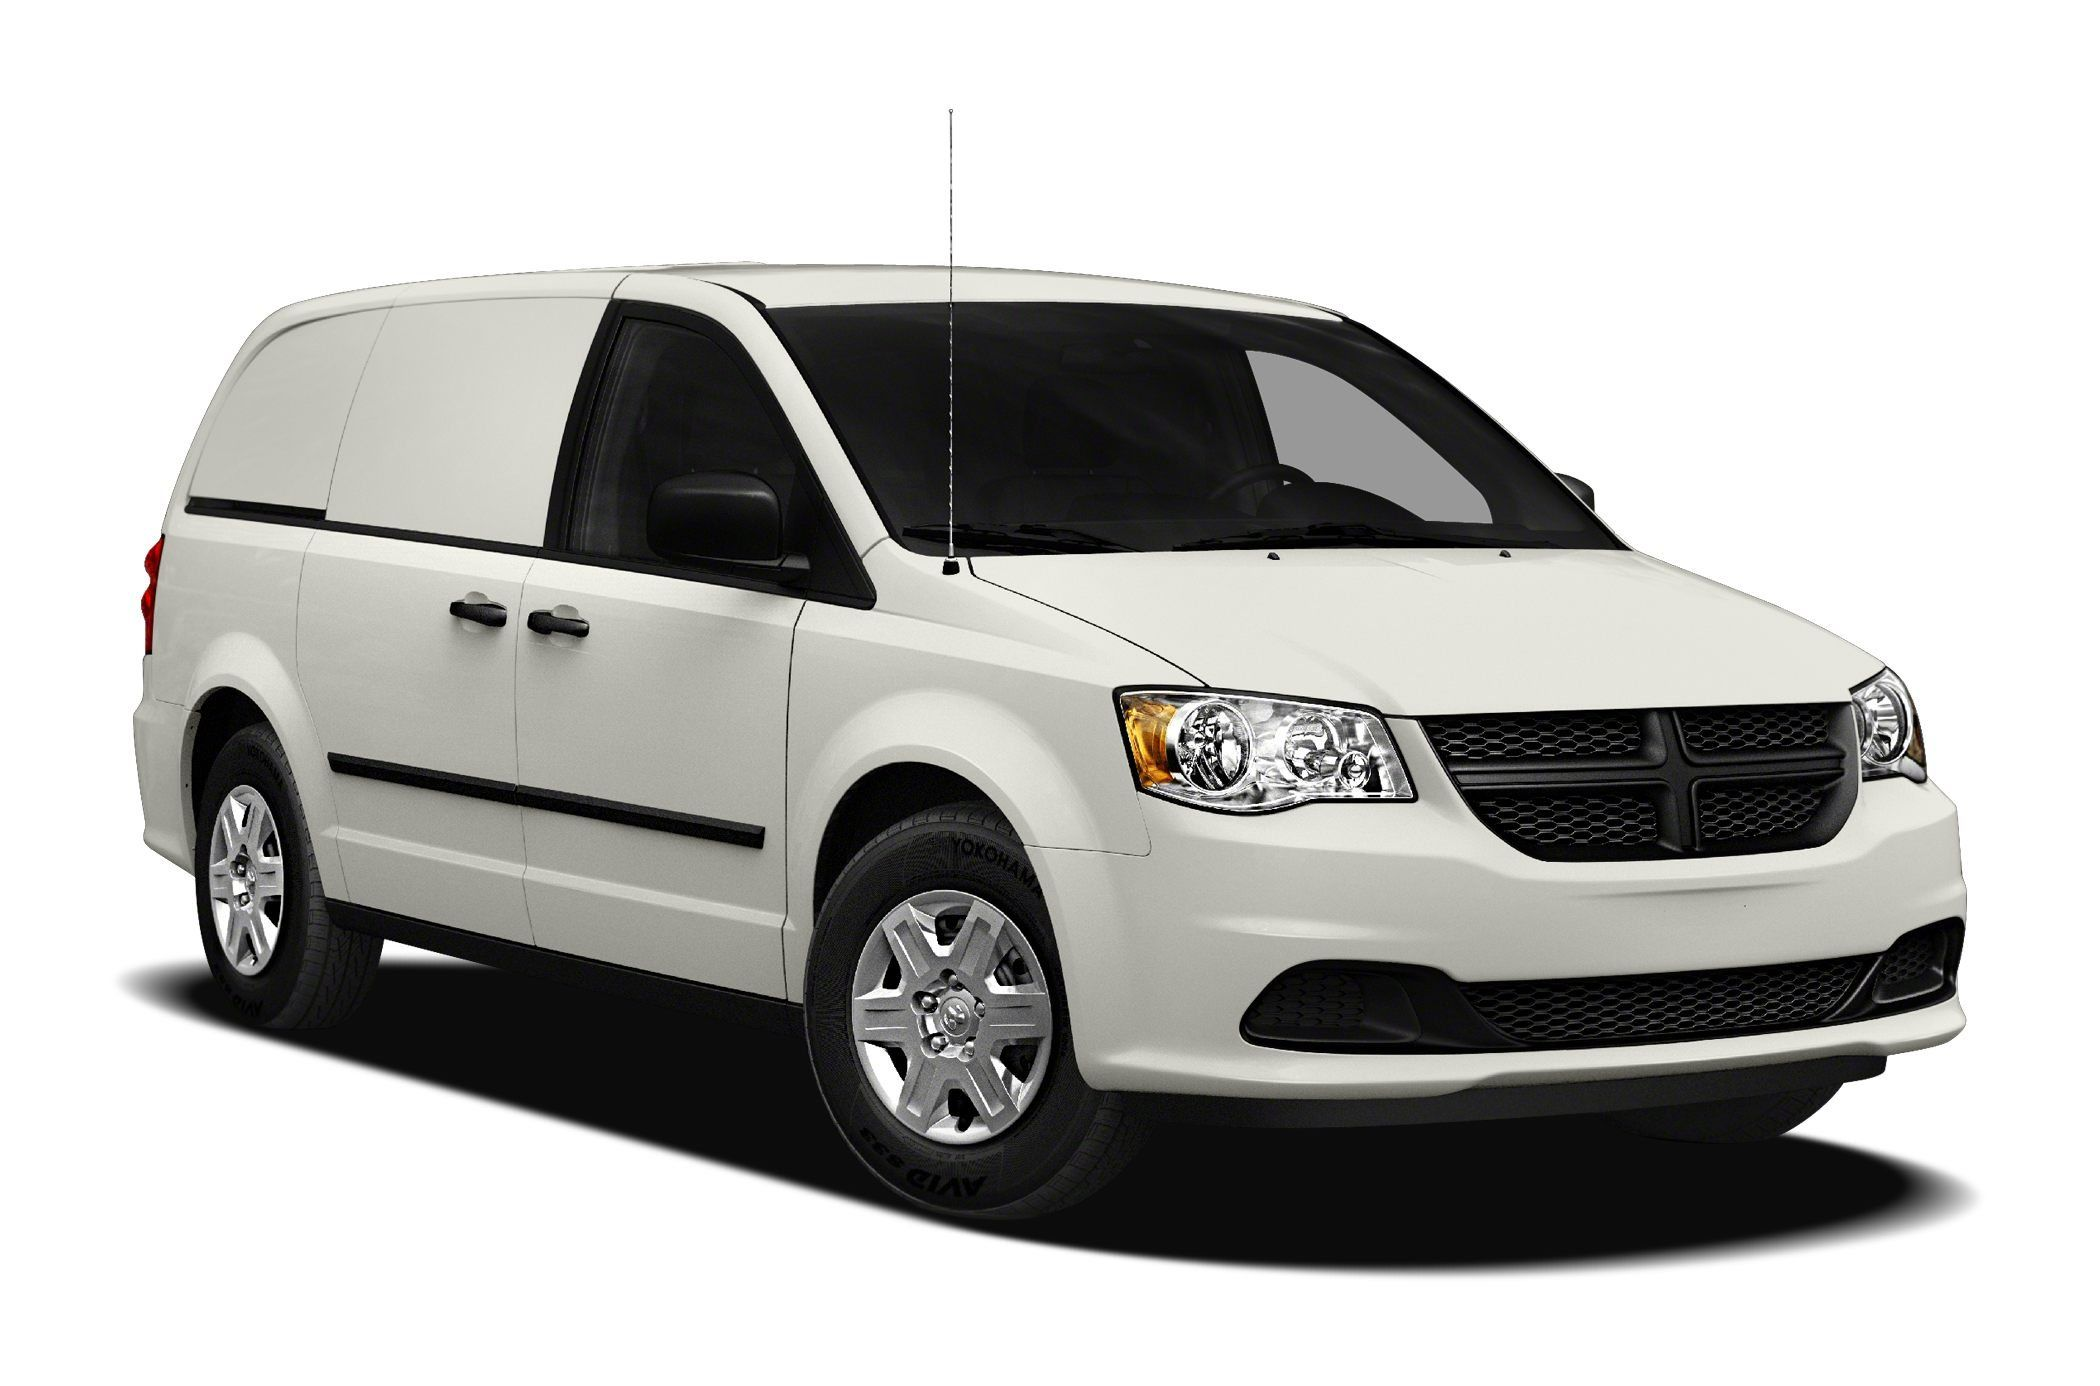 2021 Dodge Caravan Price And Release Date In 2020 Chrysler Grand Caravan Caravan Grand Caravan